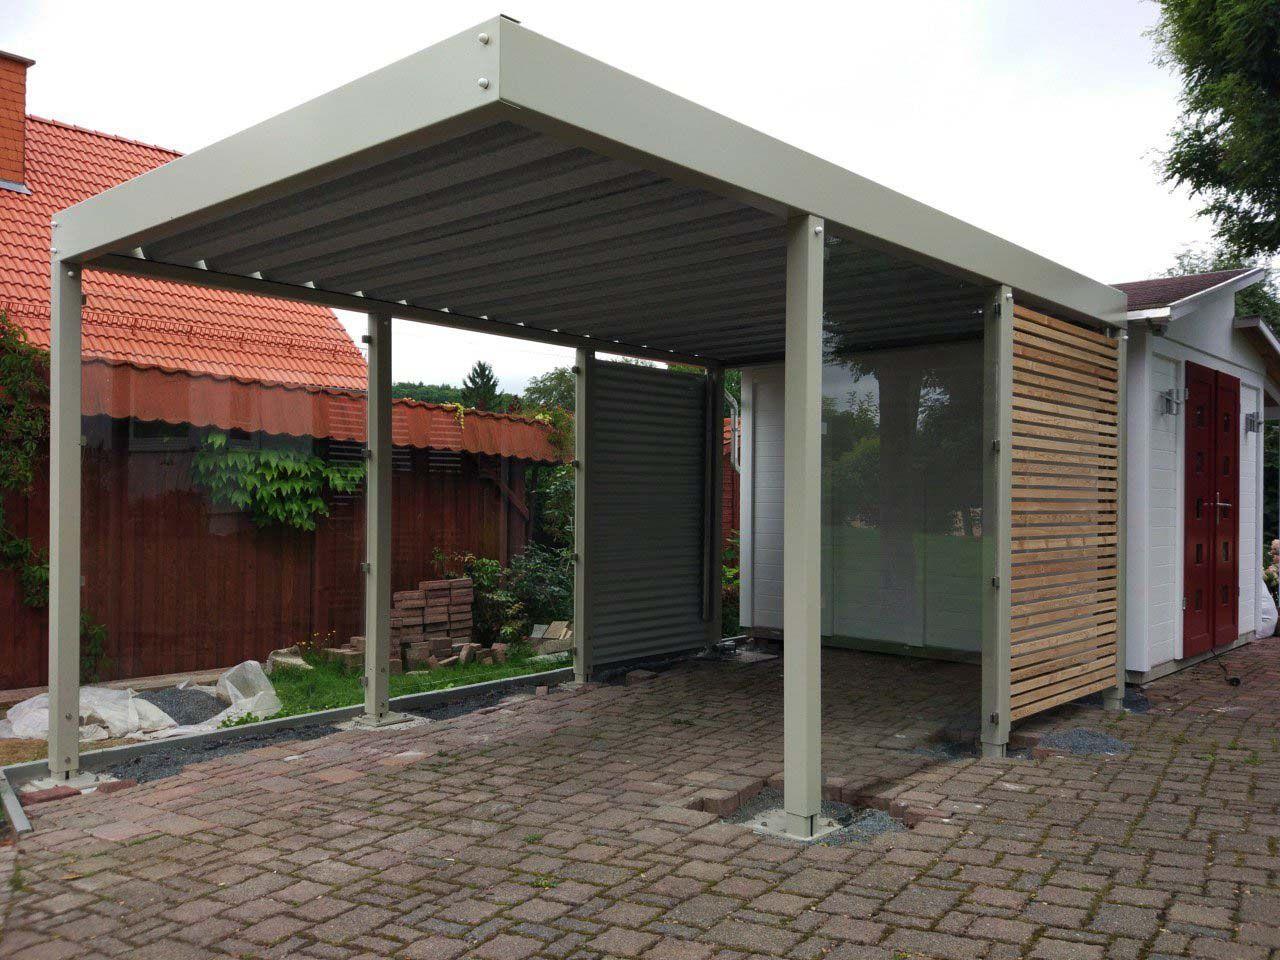 Design Metall Carport aus Holz Glas Stahl Aachen